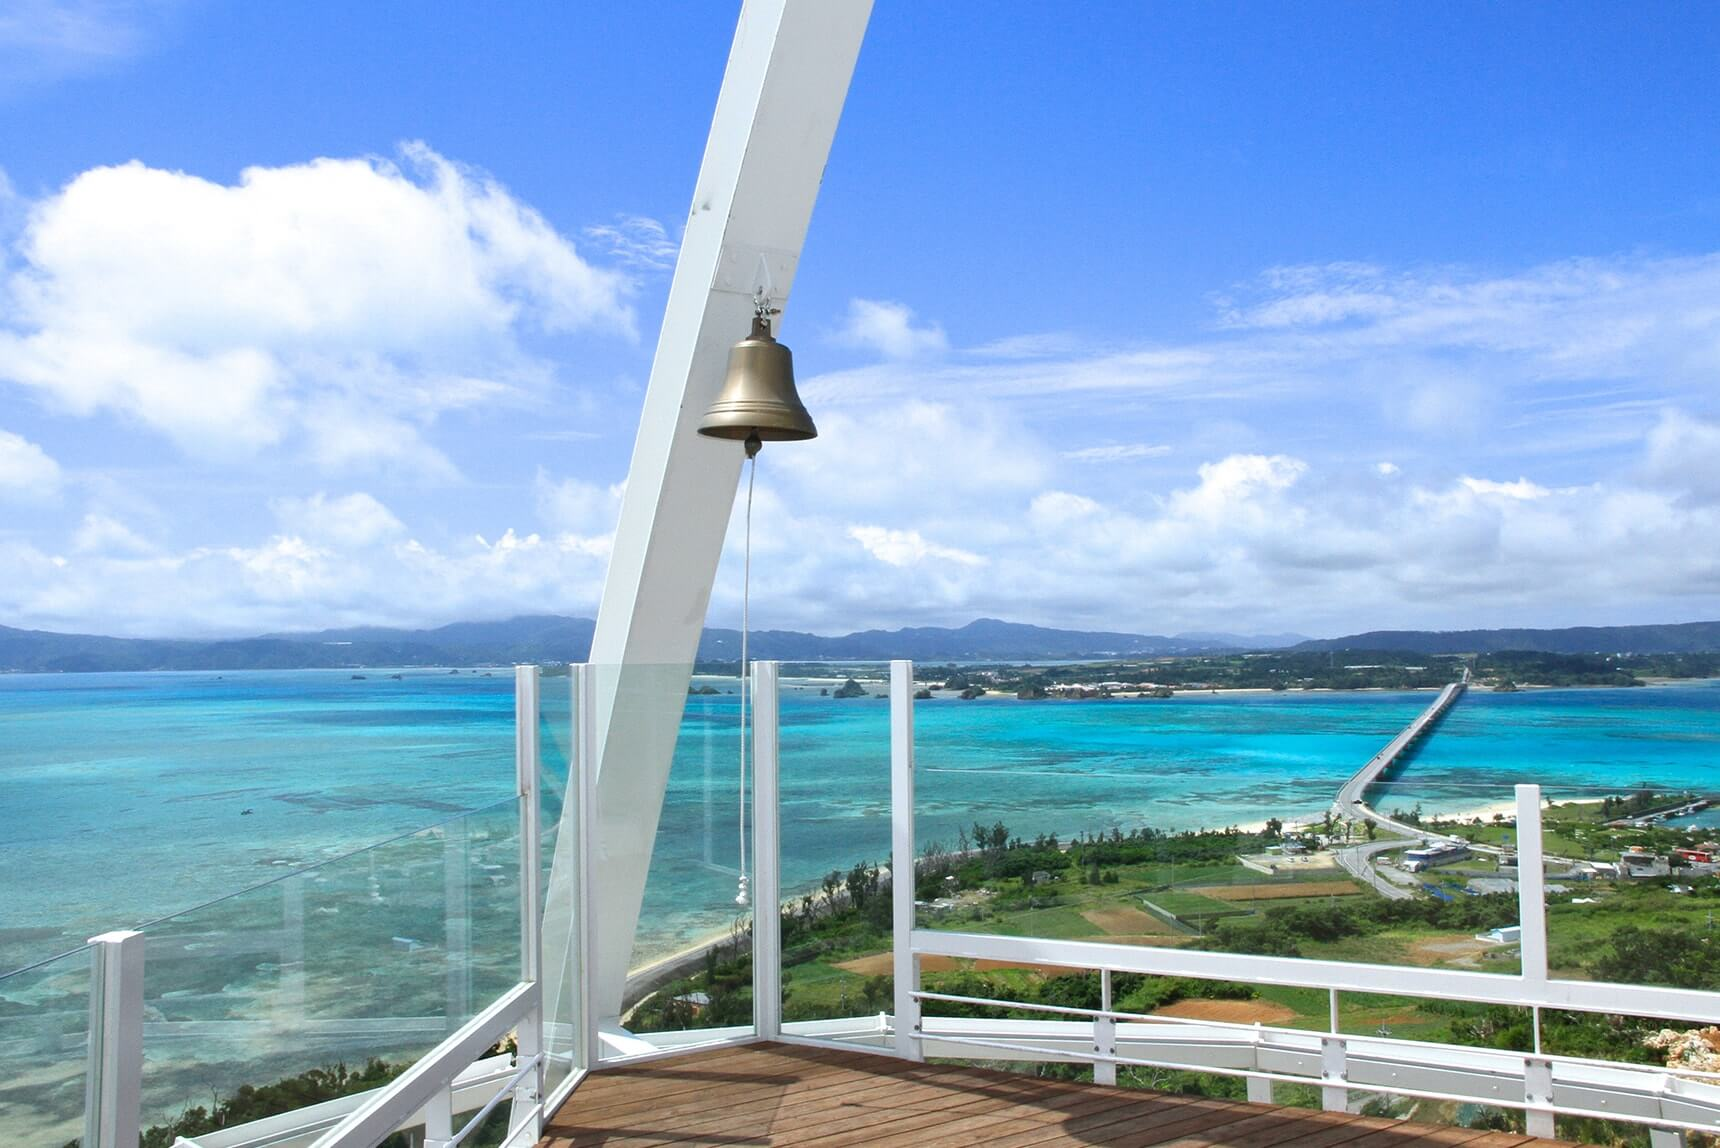 古宇利 Ocean Tower